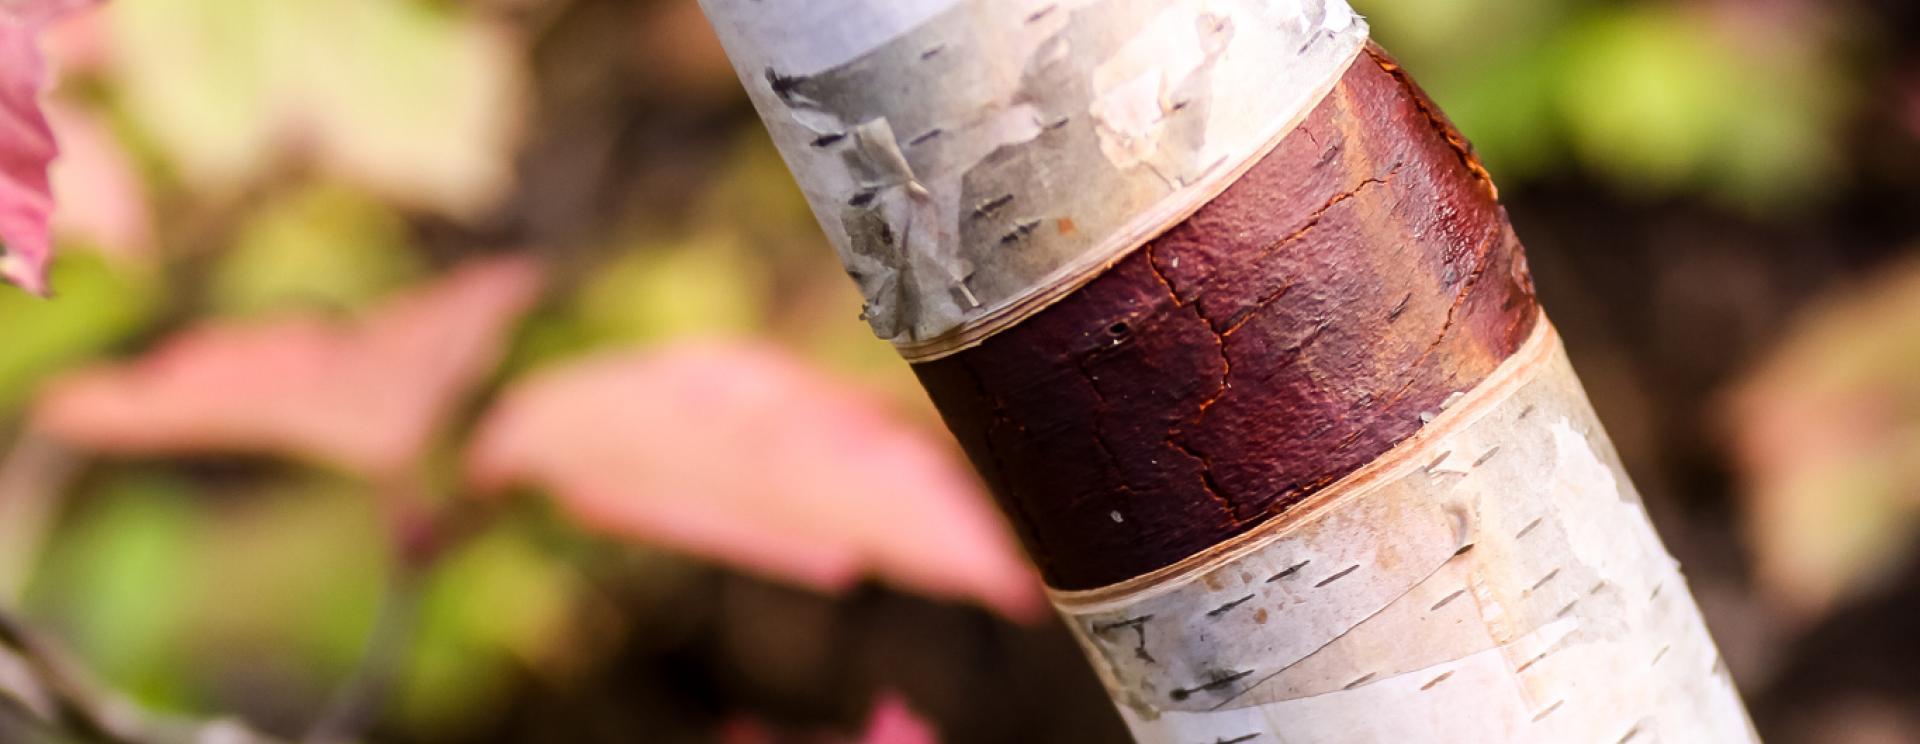 Aspen & Birch—Distinguishing the Differences